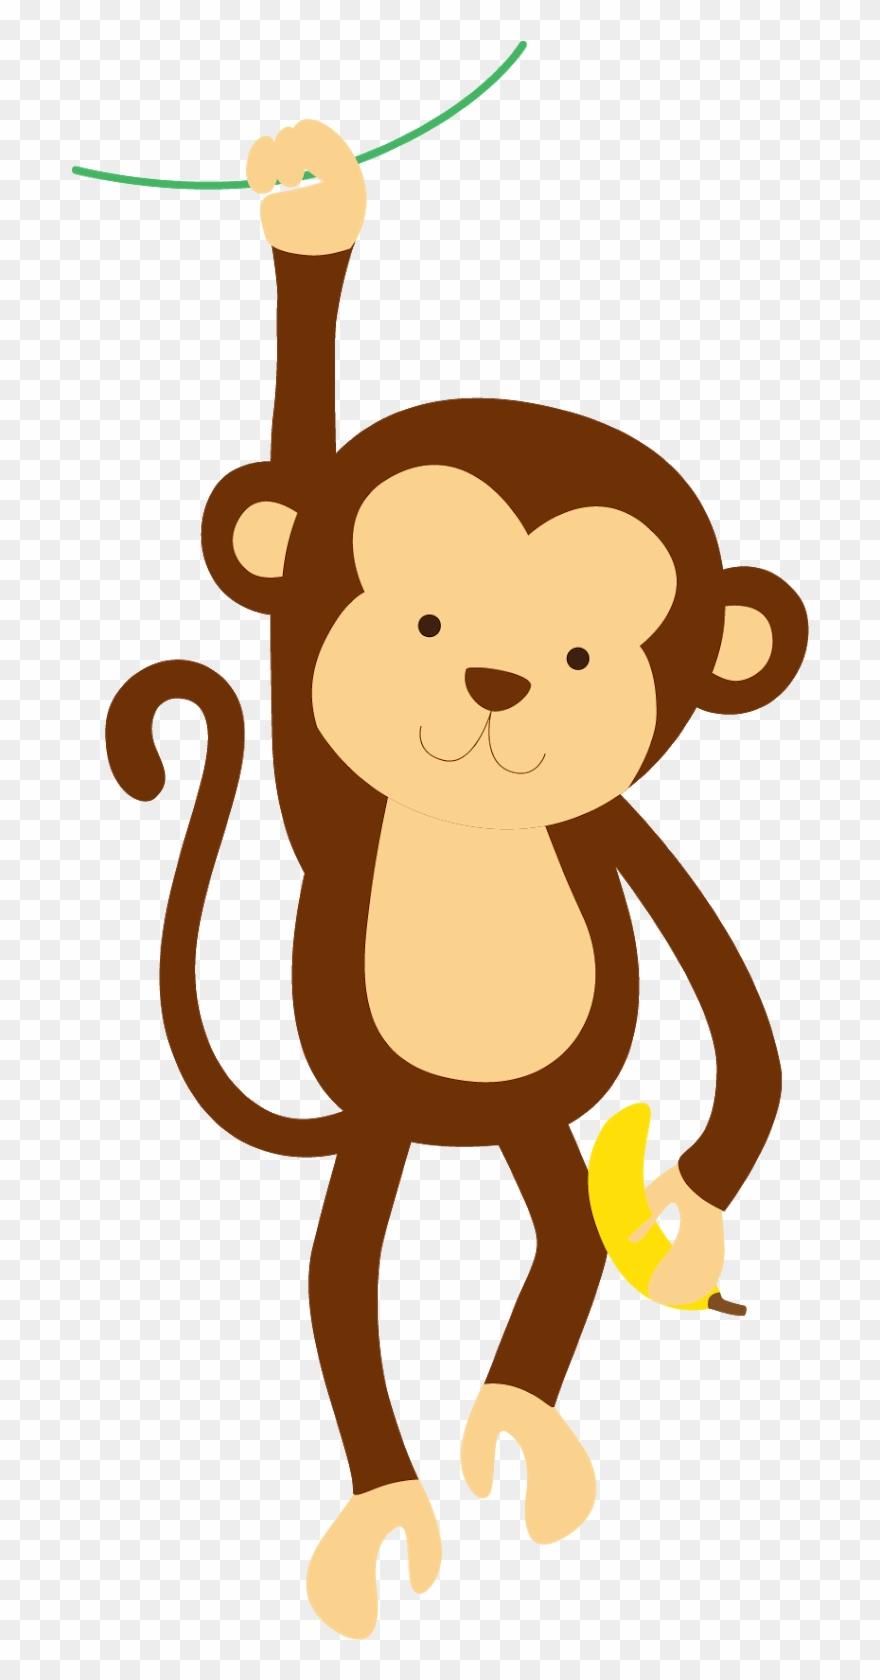 Chimp clipart image transparent library Chimpanzee Cartoon Clip Art - Monkey Png Transparent Png (#755221 ... image transparent library